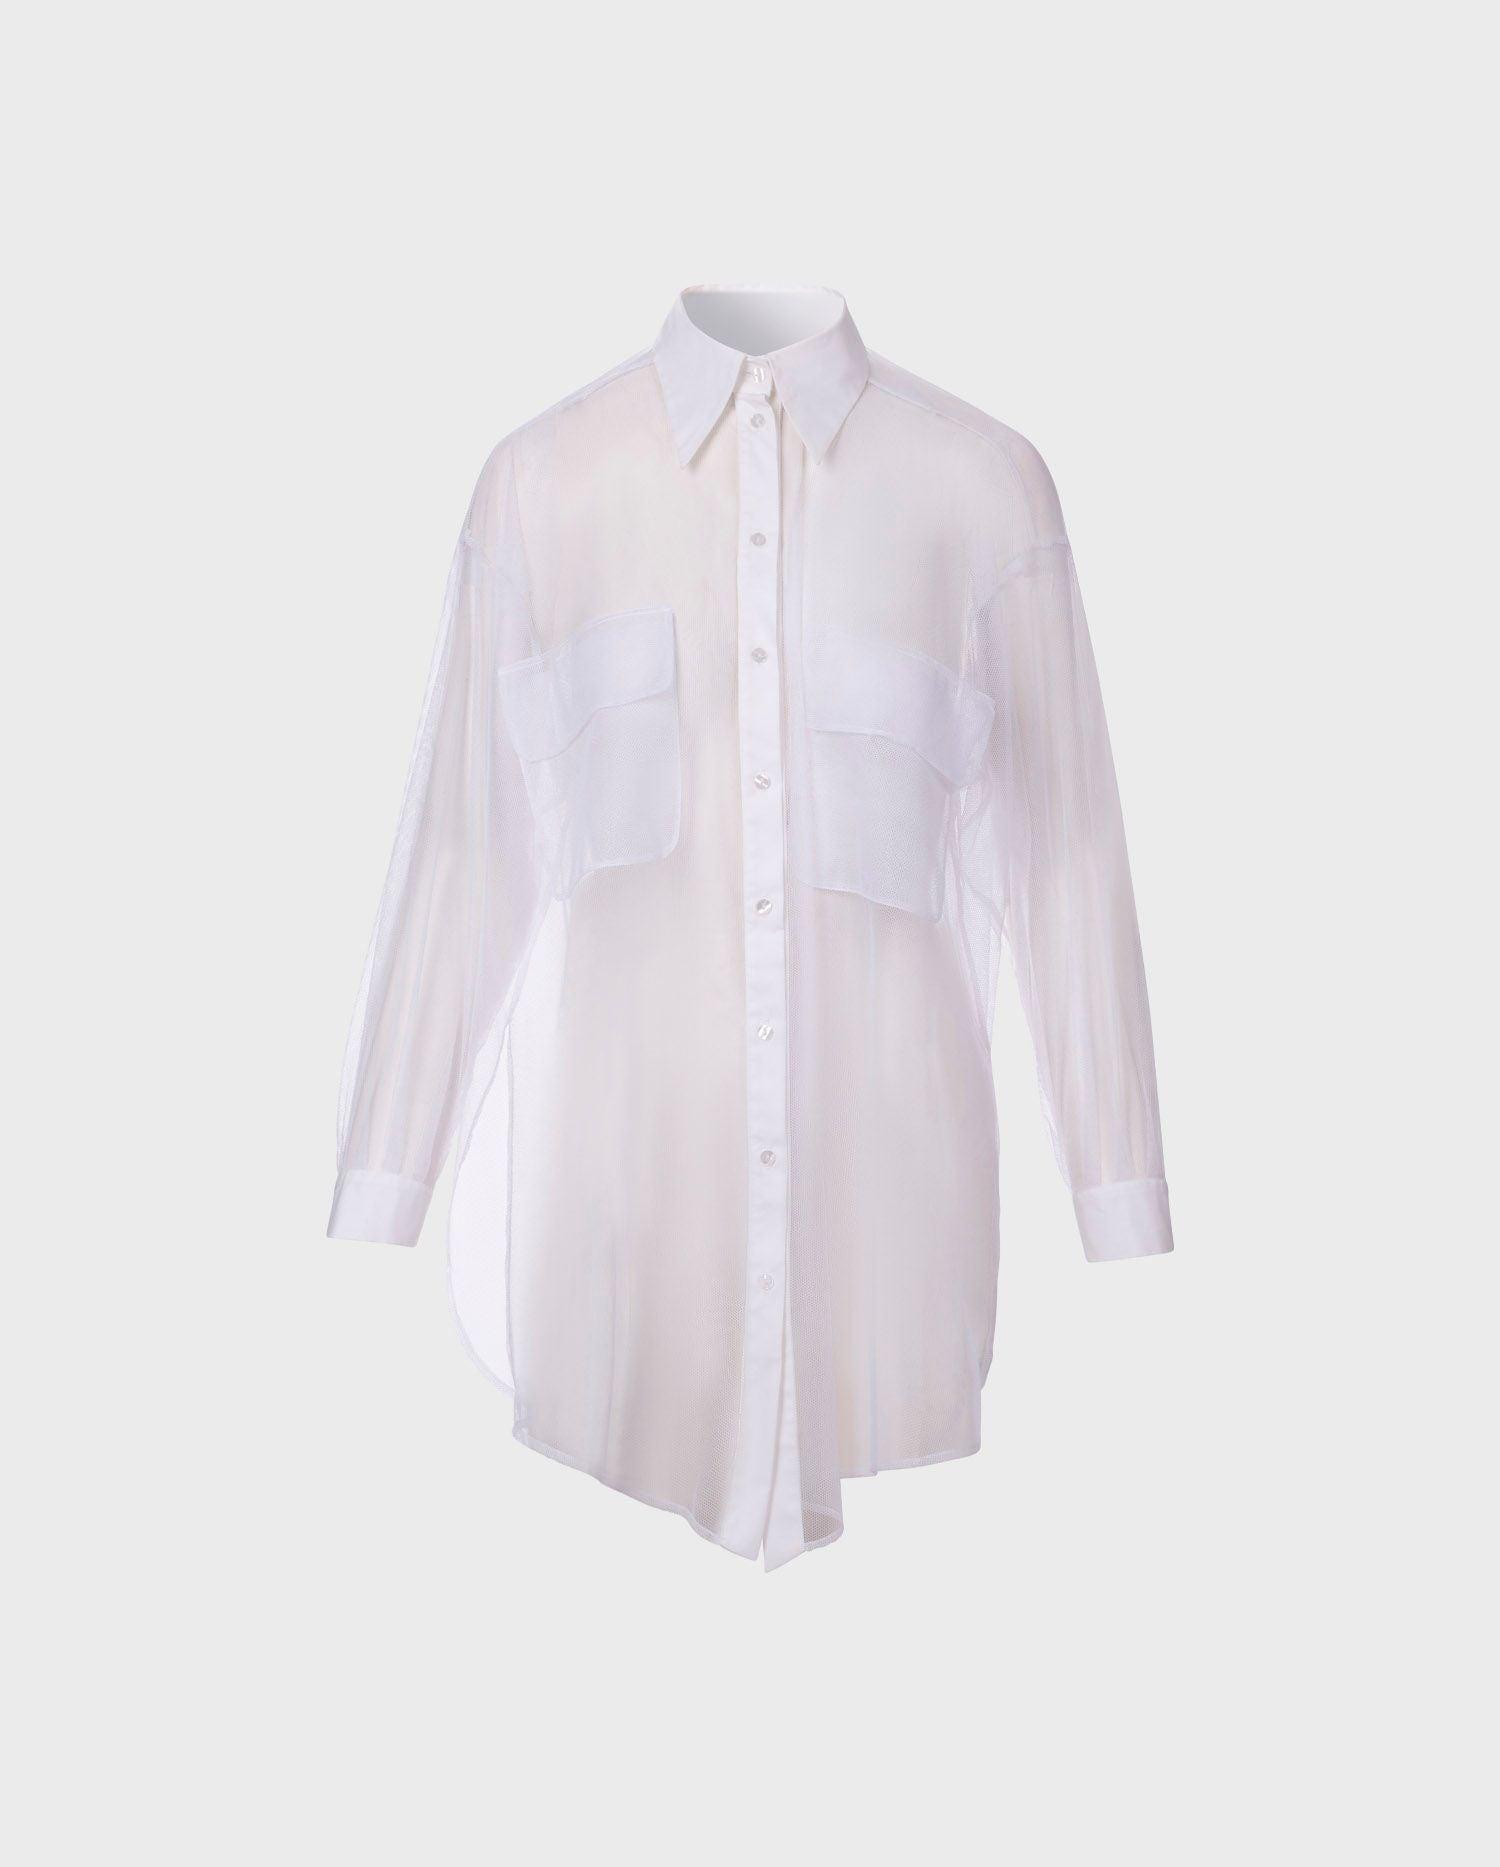 Anne Fontaine Brasilia - White Shirt